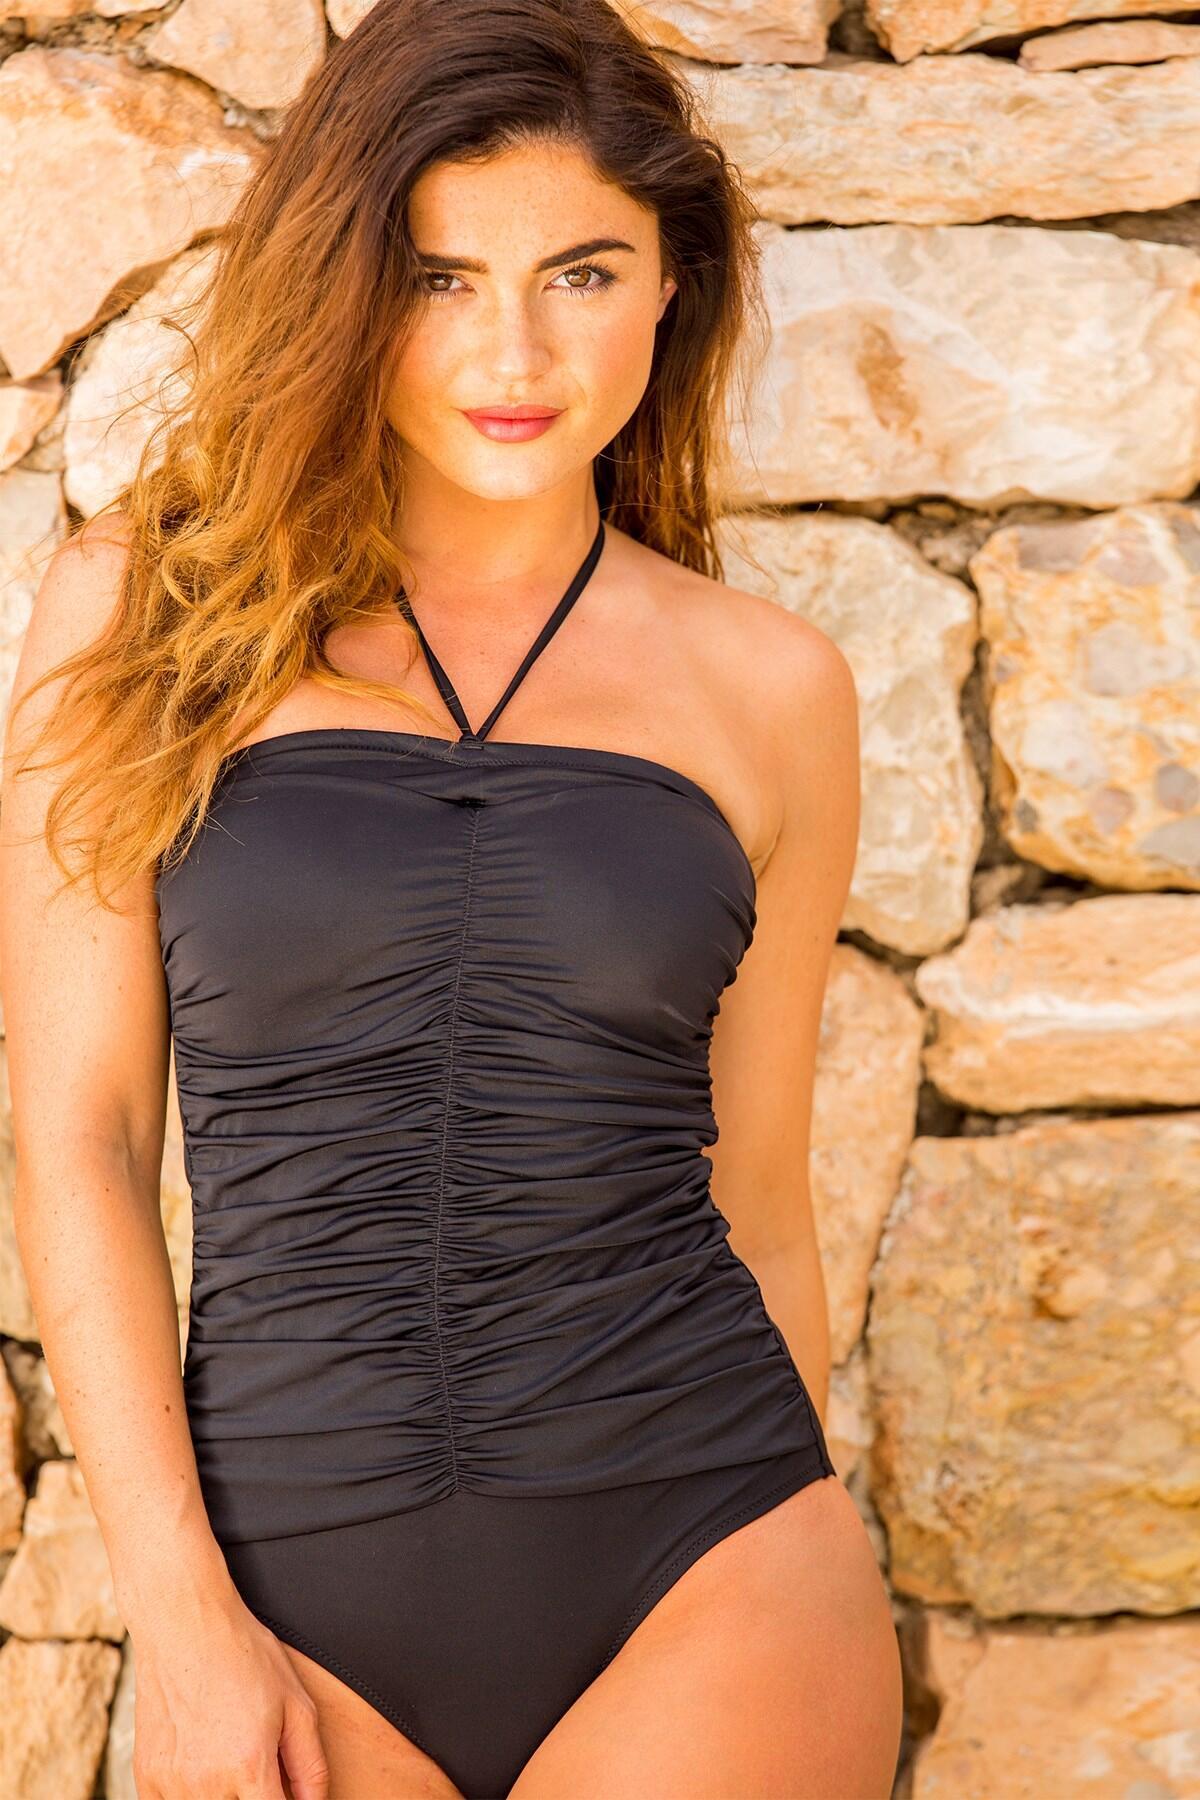 LBS Strapless Suit - Black